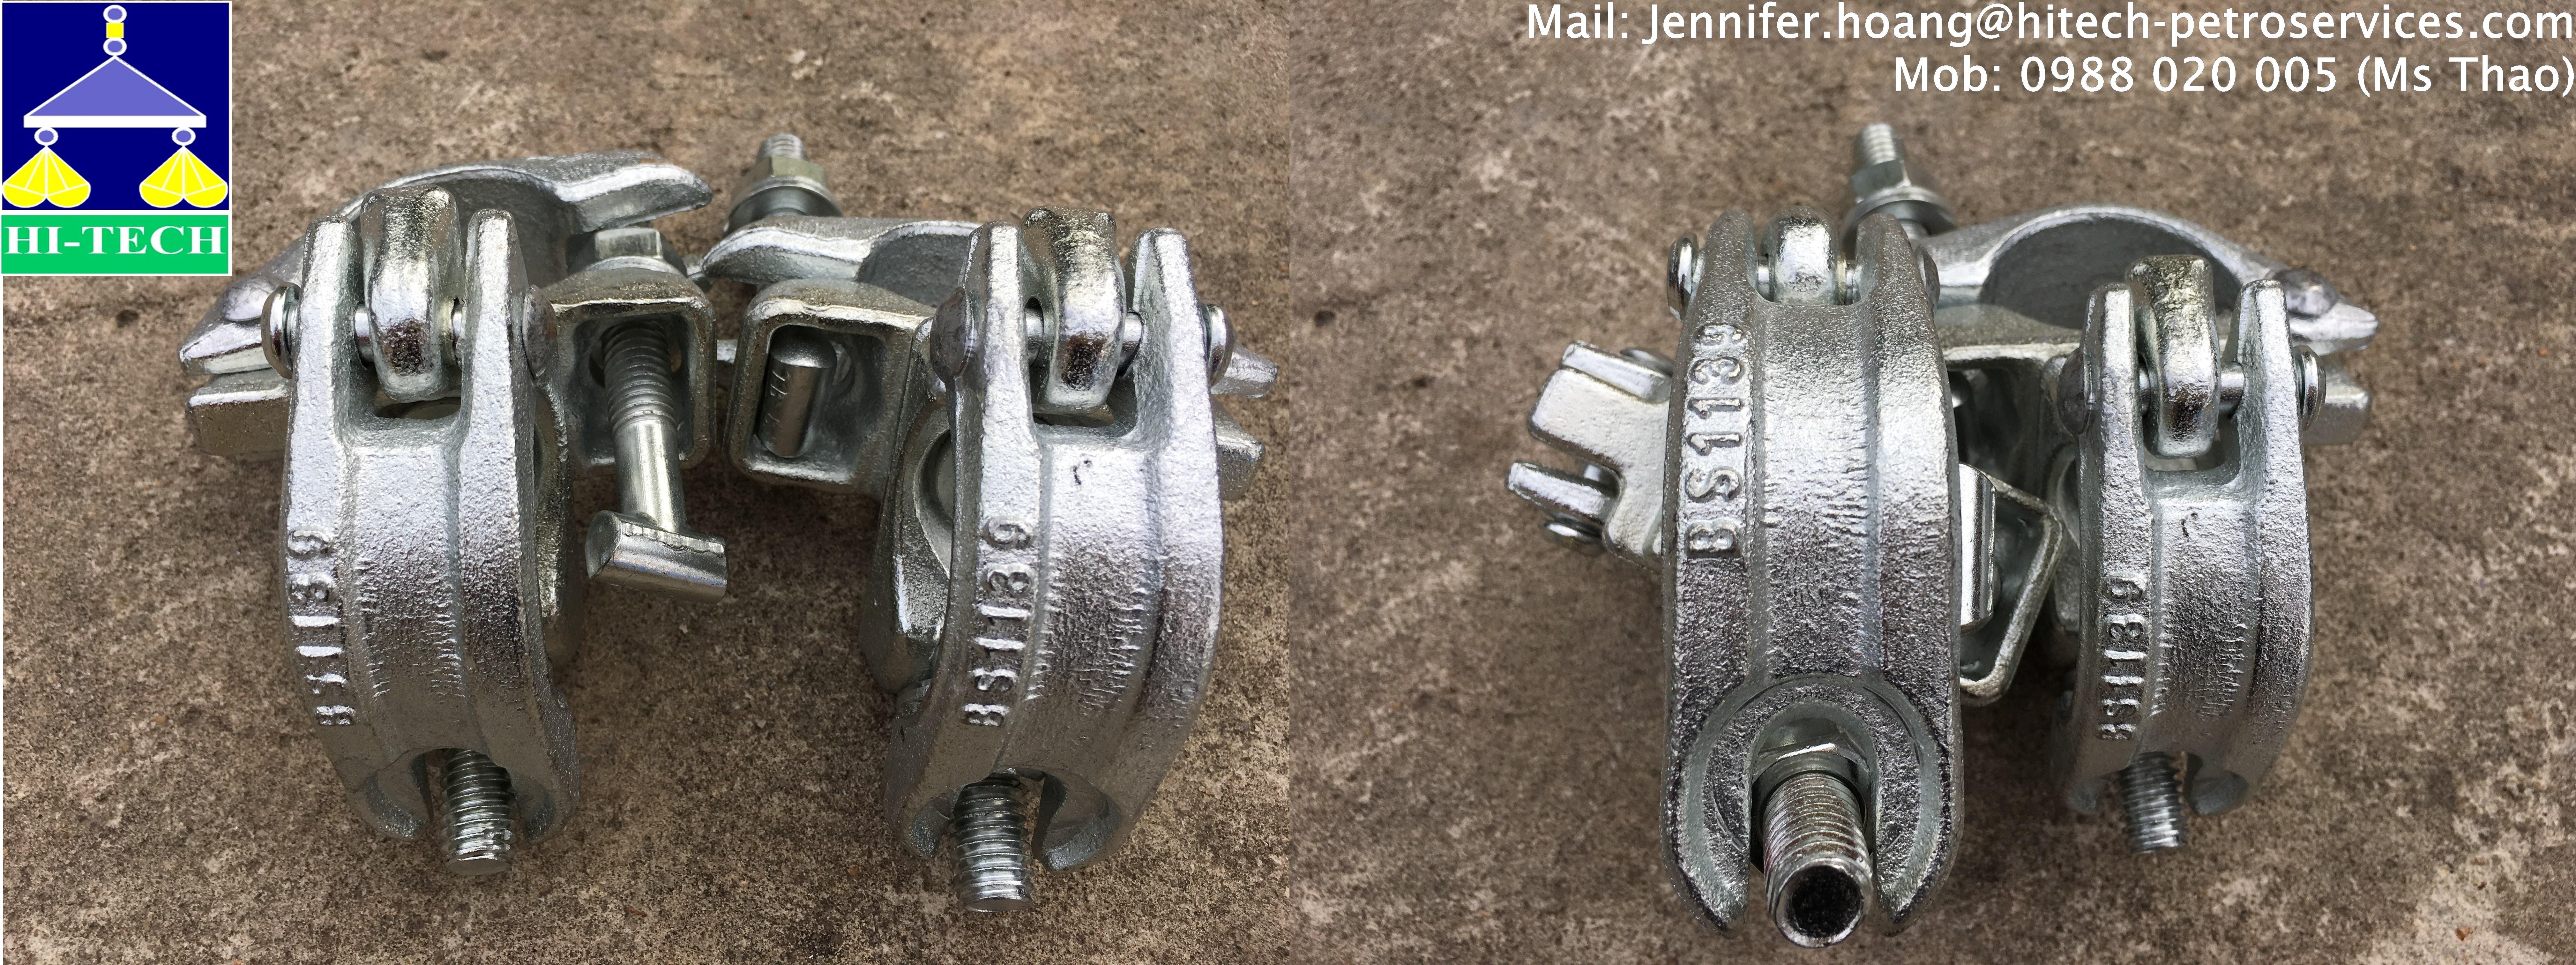 Cùm cố định (Double Coupler) BS1139